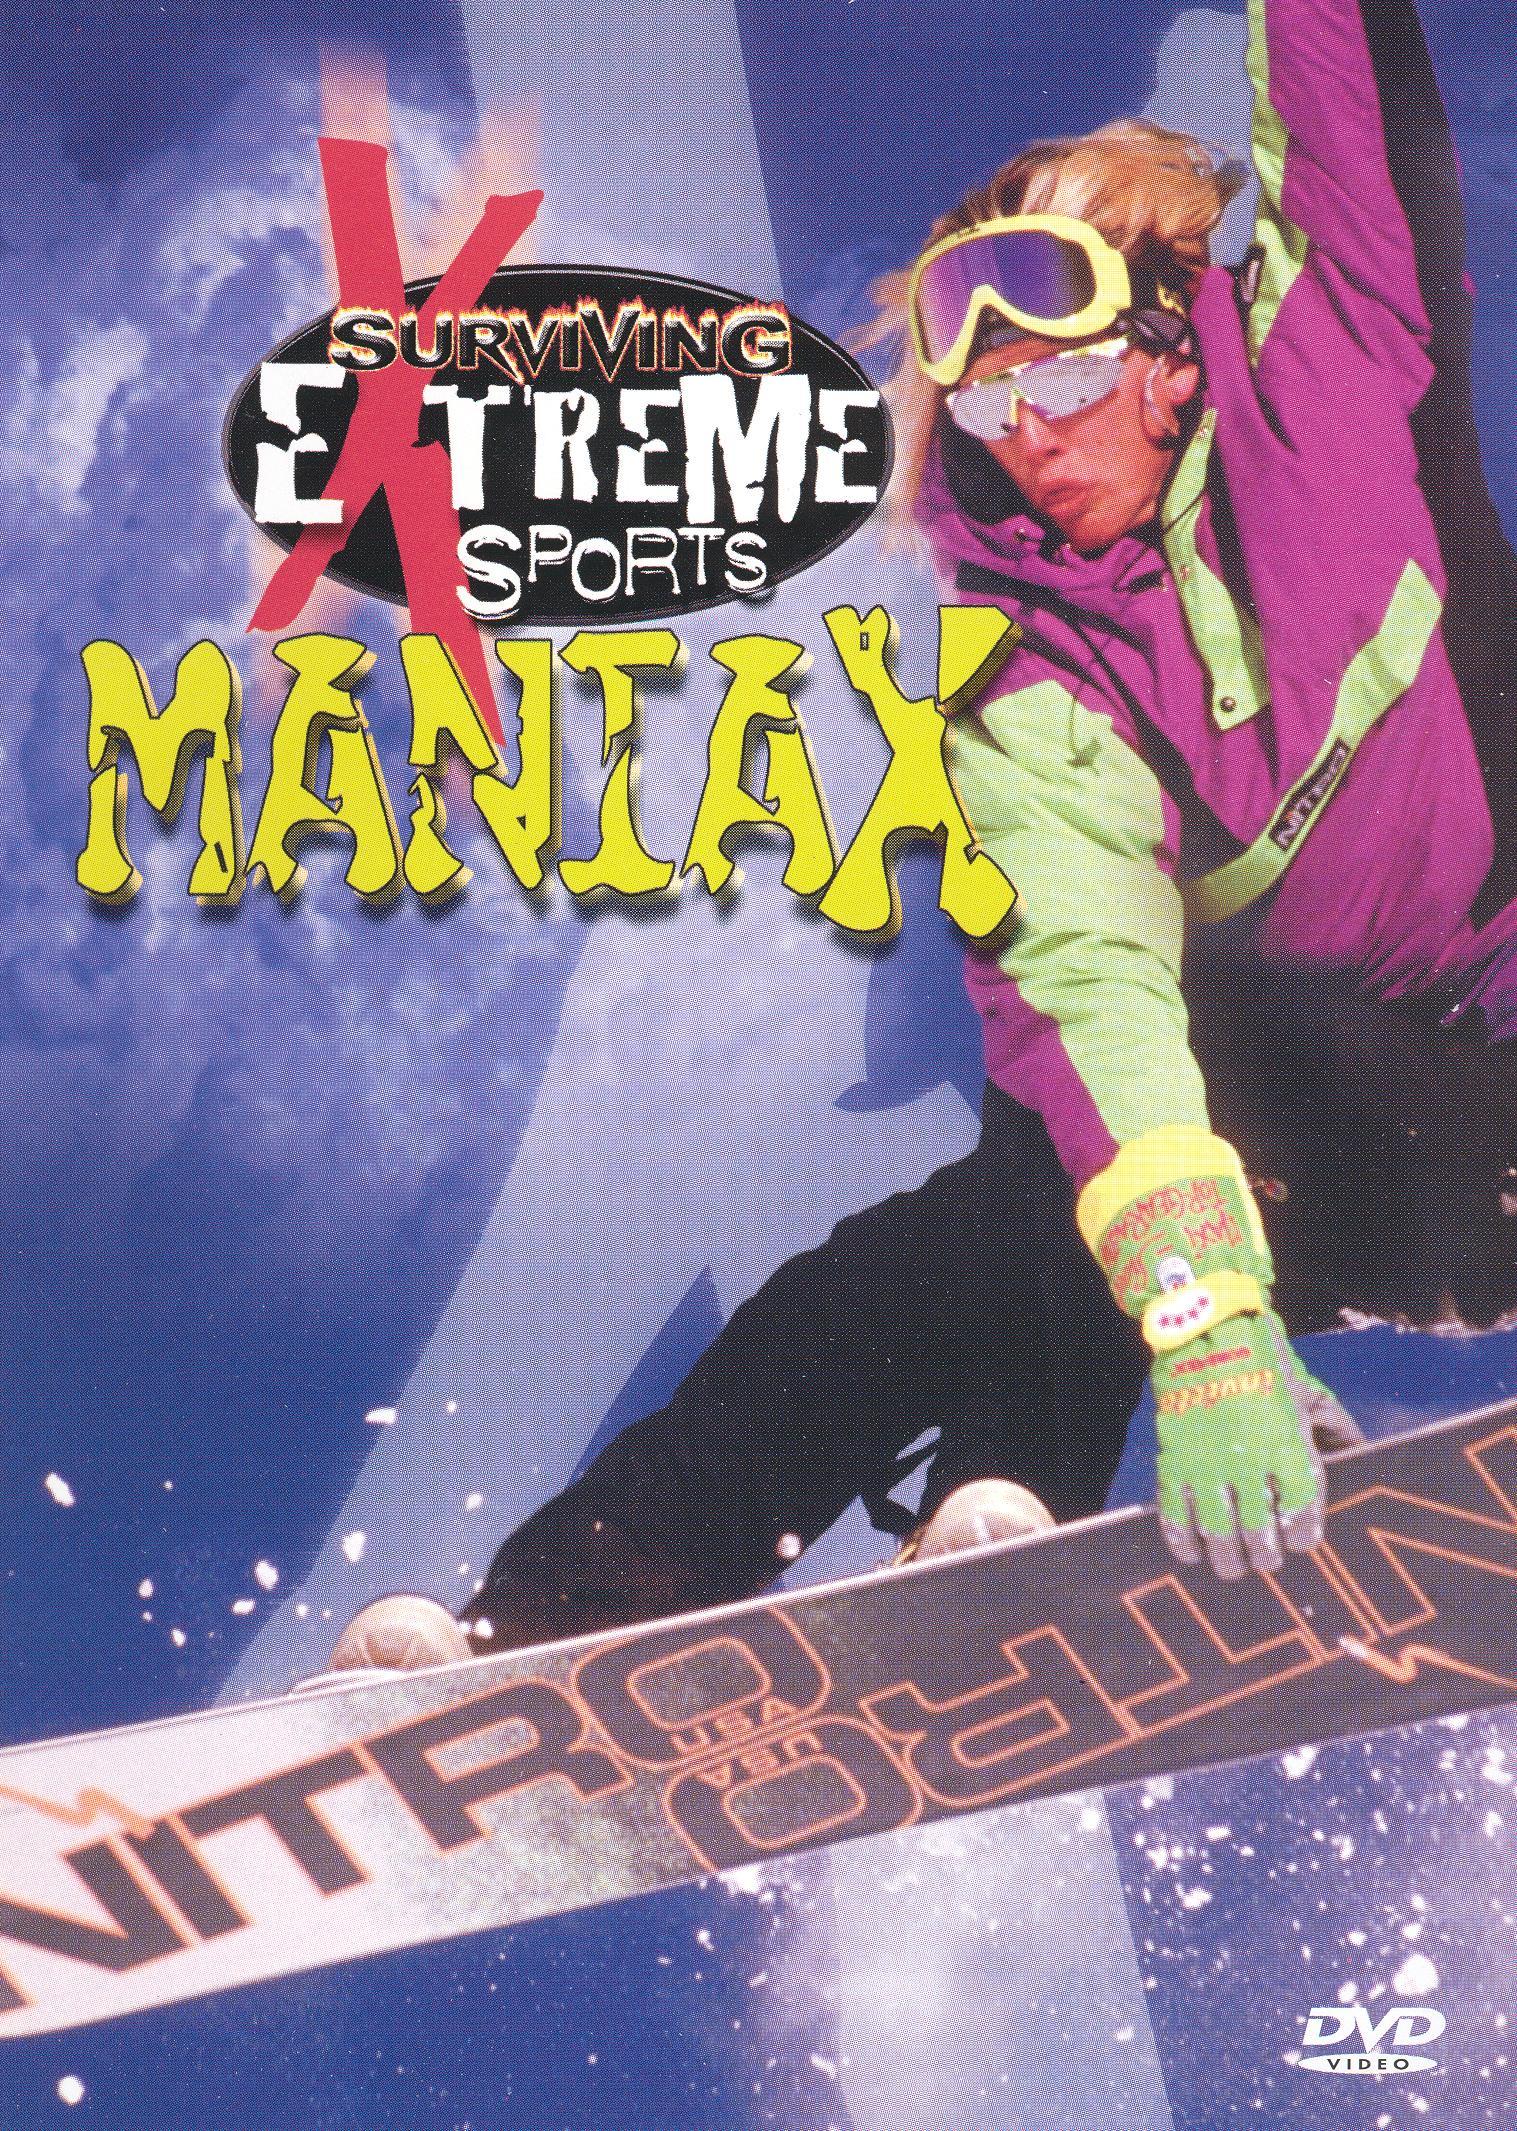 Surviving Extreme Sports: Maniax